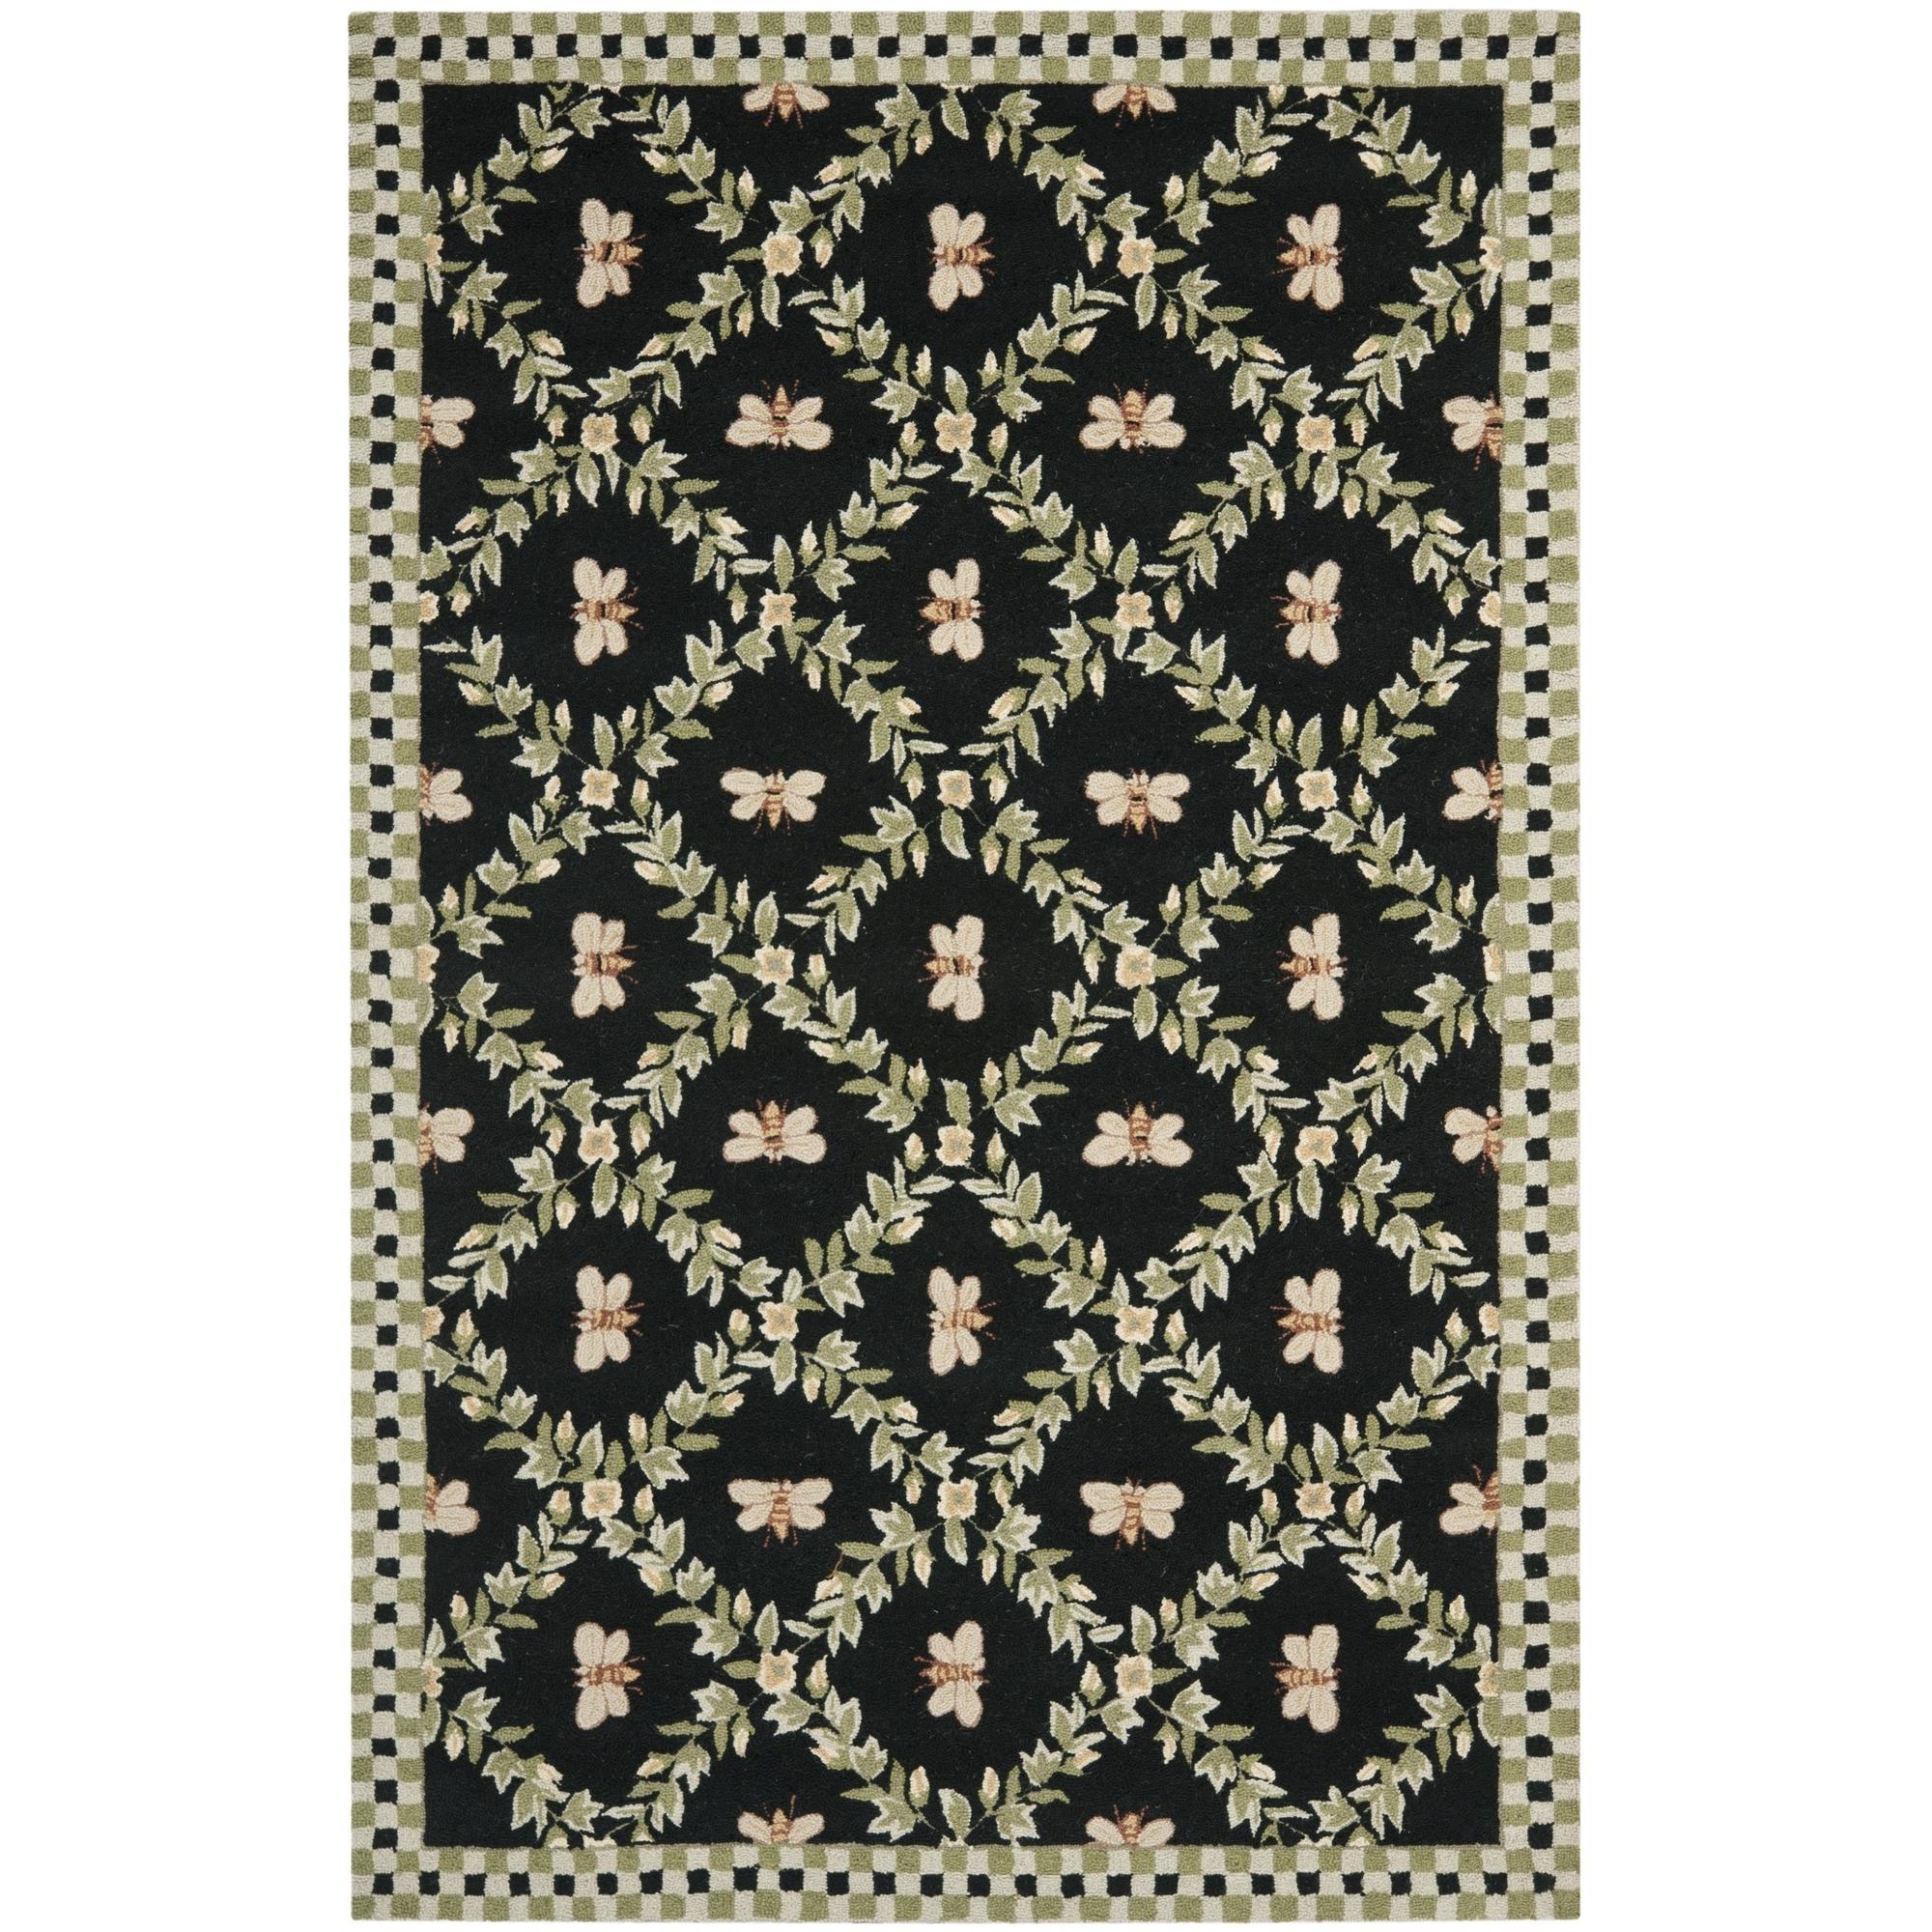 Safavieh Chelsea Hand Hooked Black Wool Area Rugs Hk55b Regarding Black Wool Area Rugs (#12 of 15)